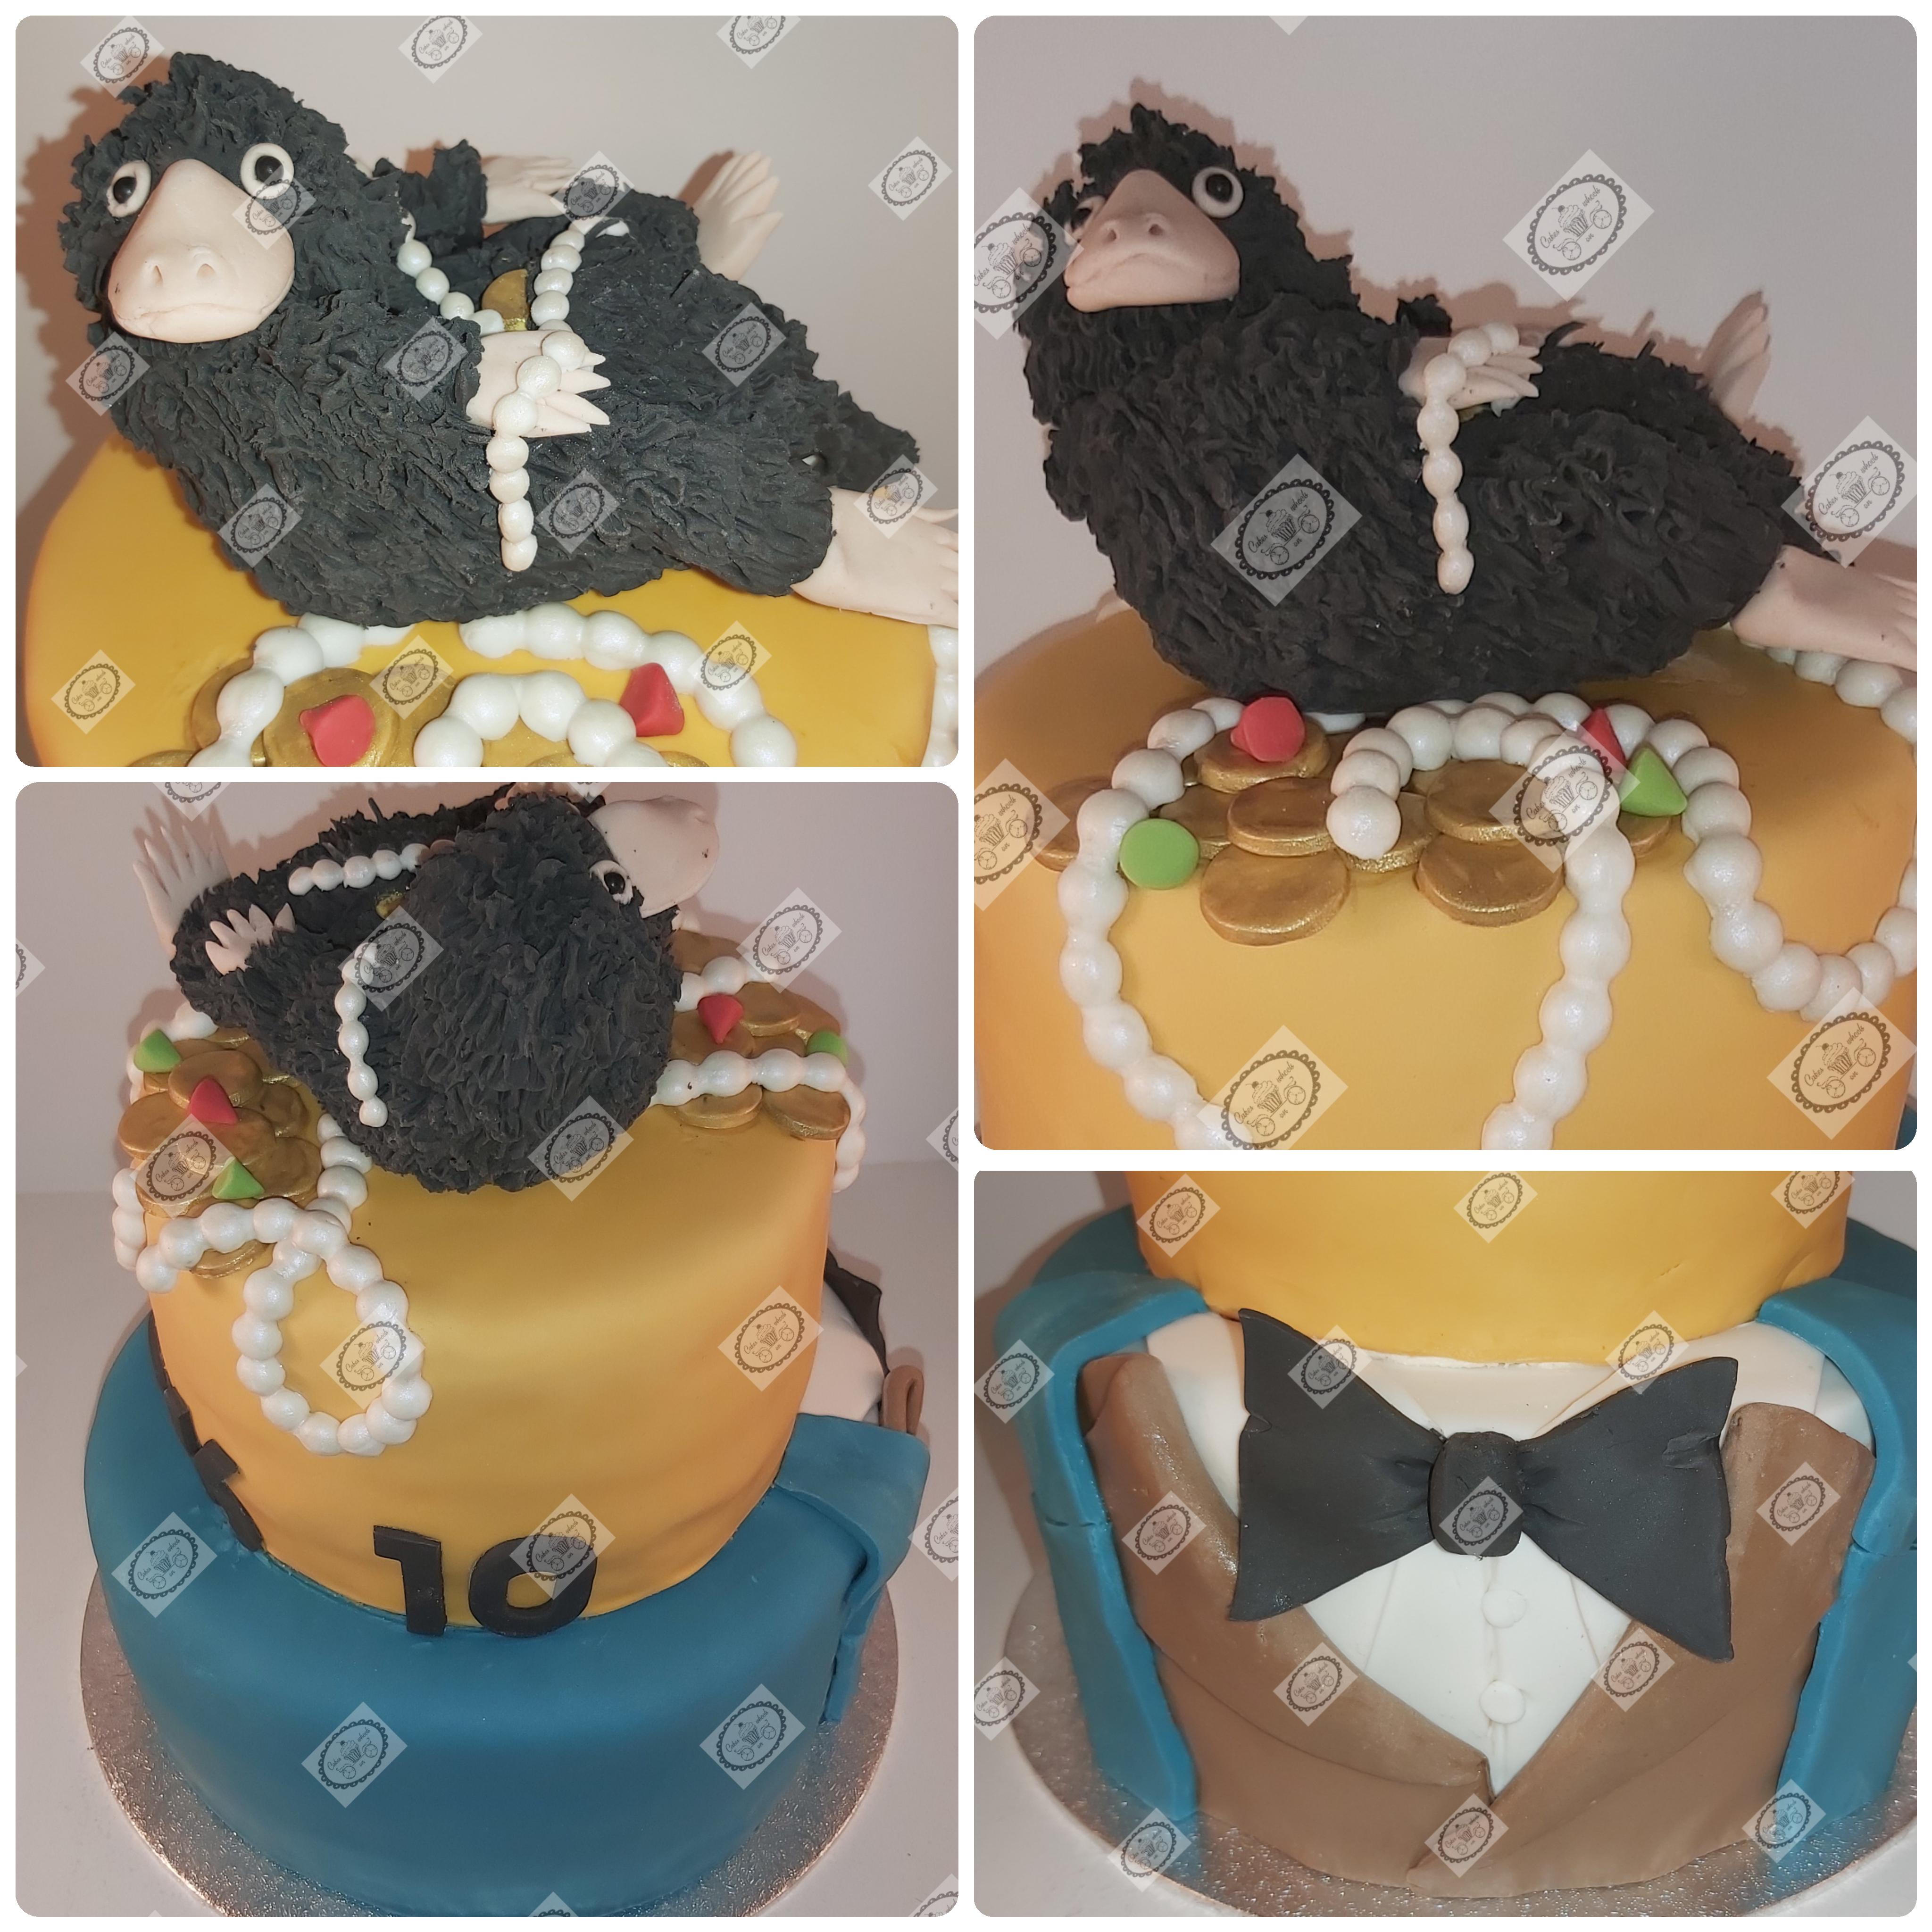 Fantastic beasts taart